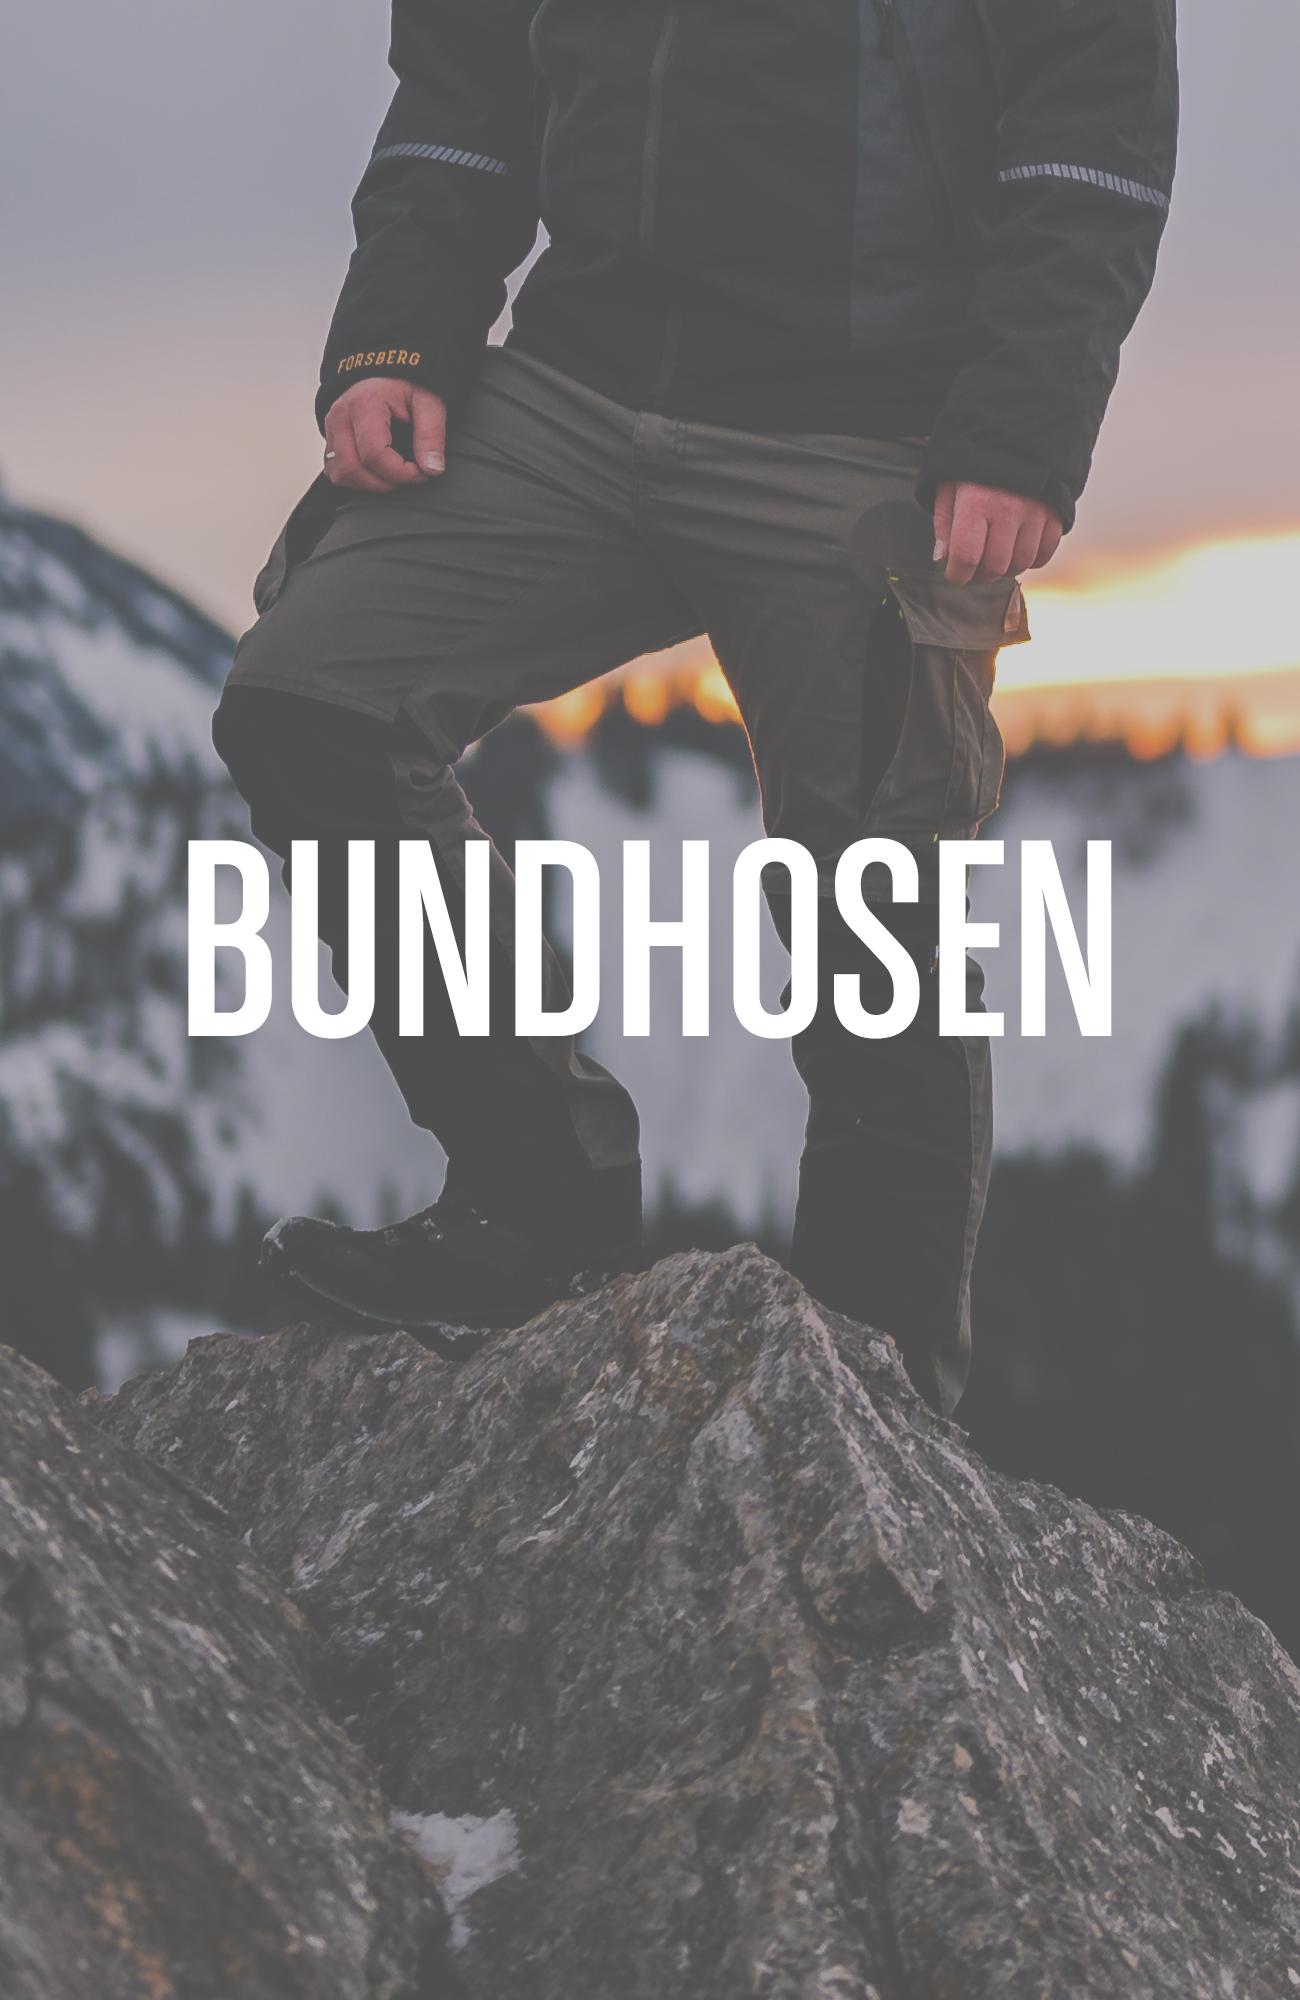 Bundhosen